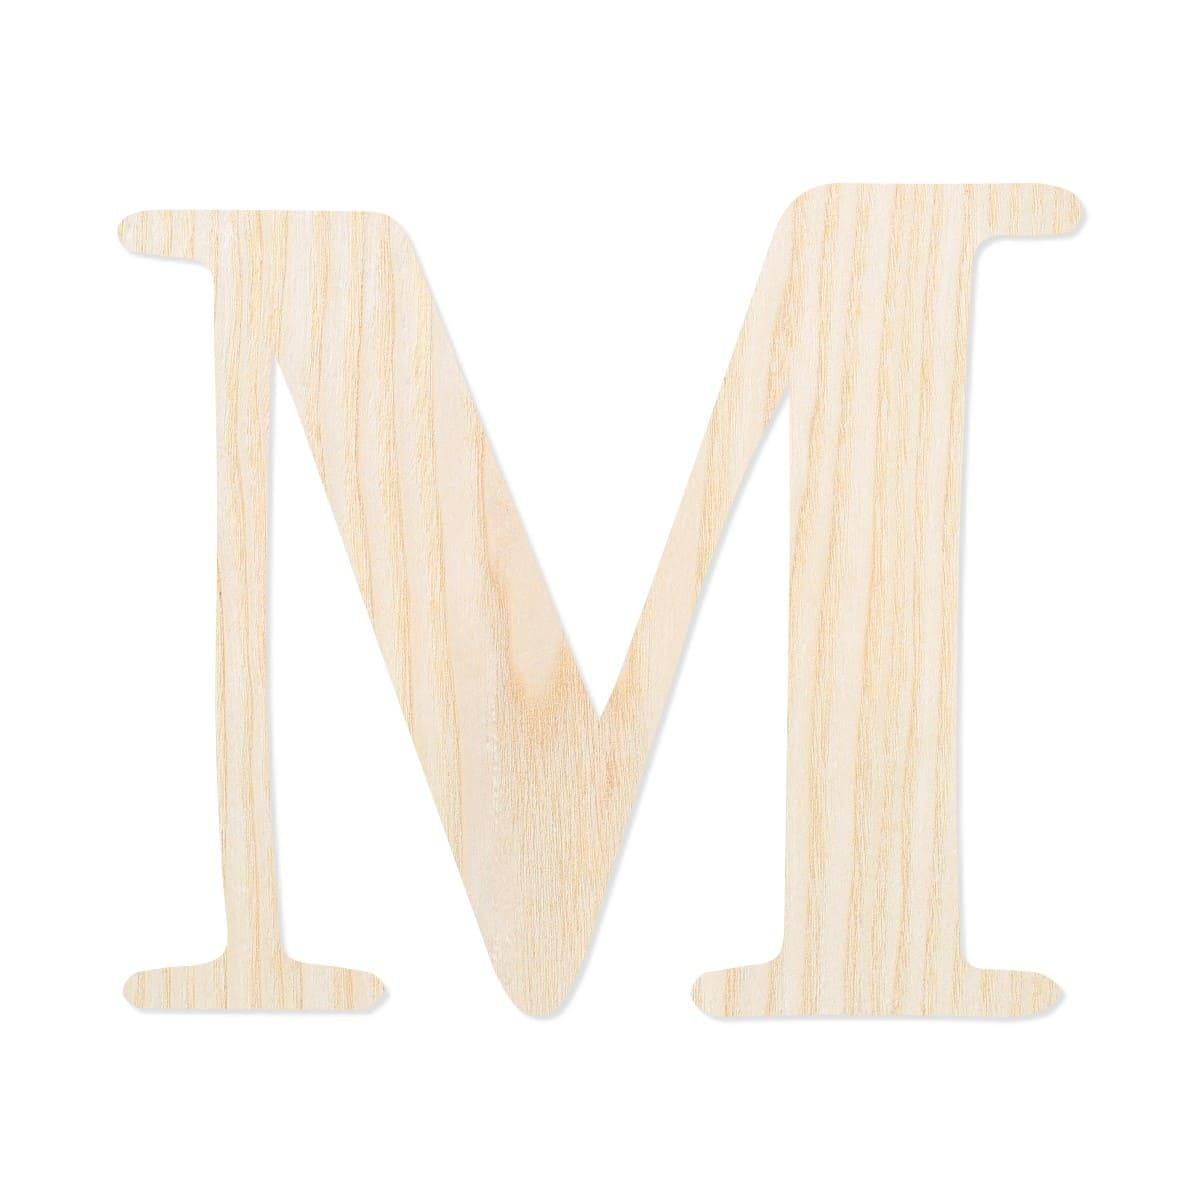 holz furnier buchstaben magnolia schriftzug aus hellem 0 6mm echtholzfurnier gr enauswahl. Black Bedroom Furniture Sets. Home Design Ideas